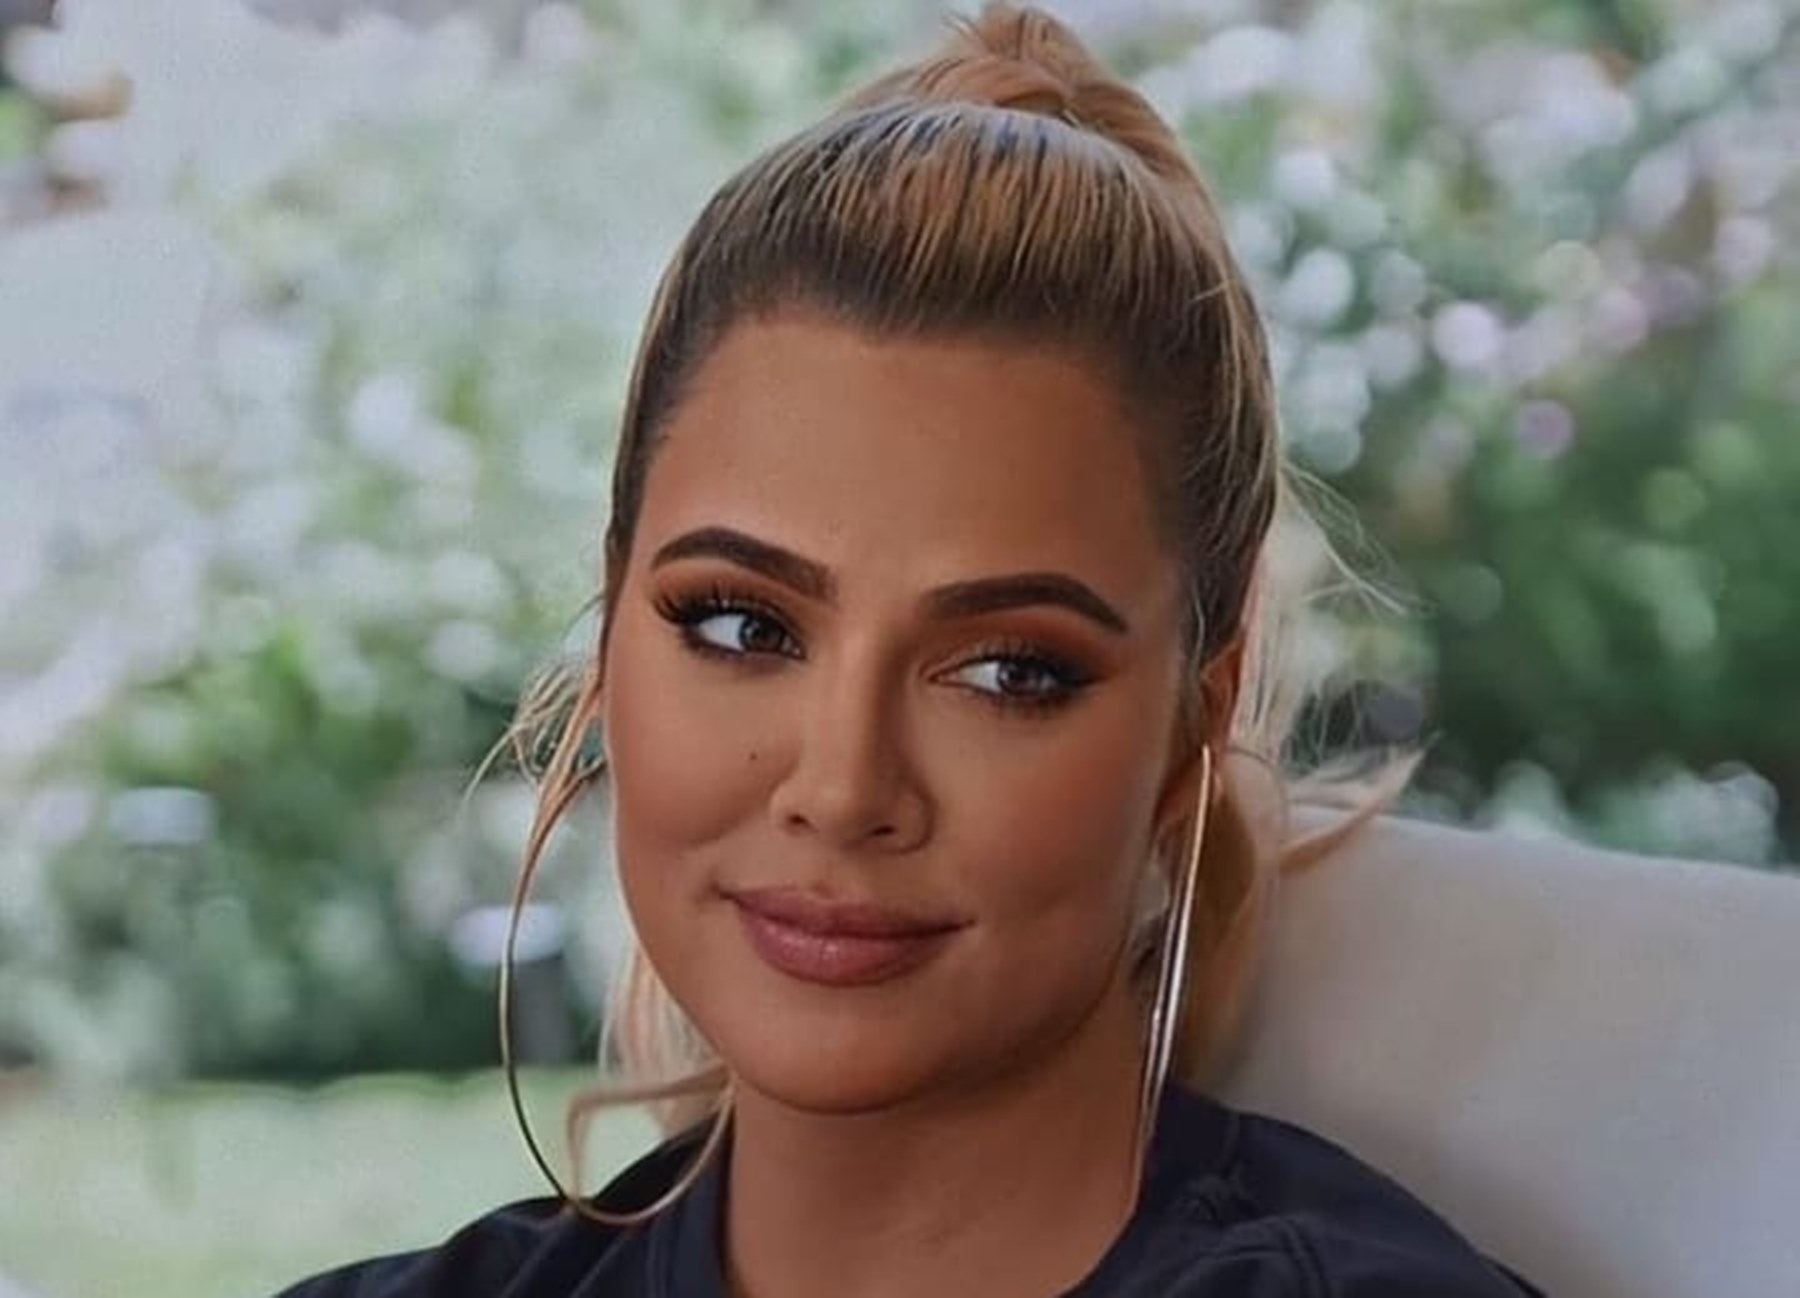 Khloe Kardashian Tristan Thompson True Kylie Jenner